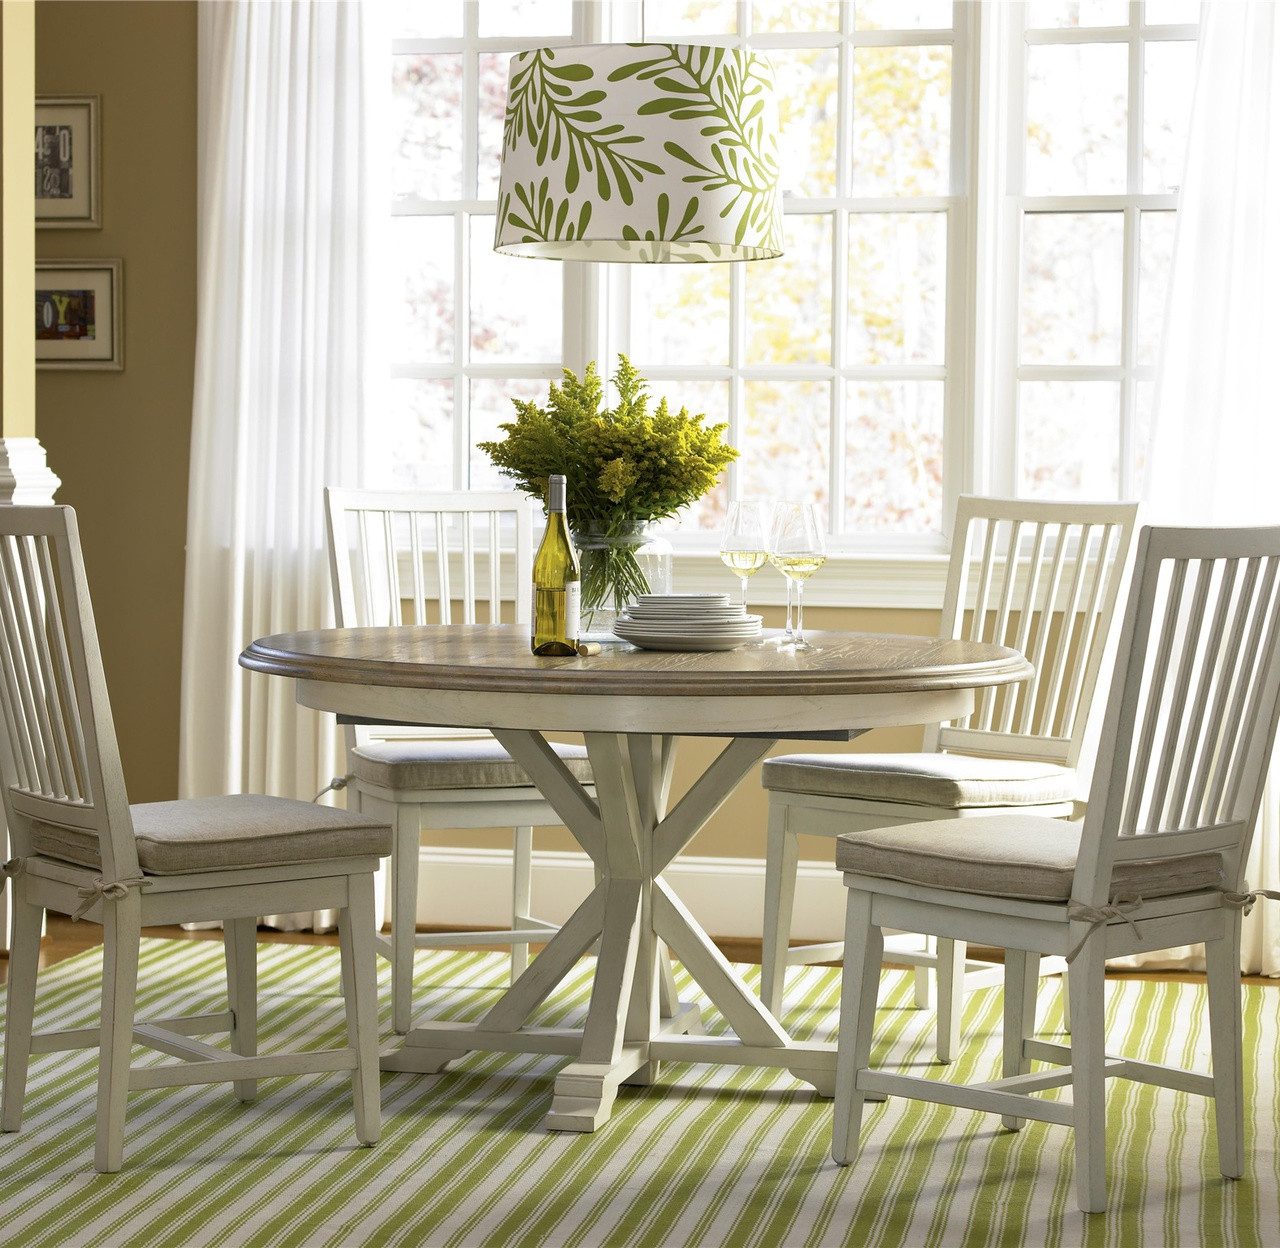 round dining room sets with leaf. Coastal Beach White Oak Round Dining Room Set Sets With Leaf A